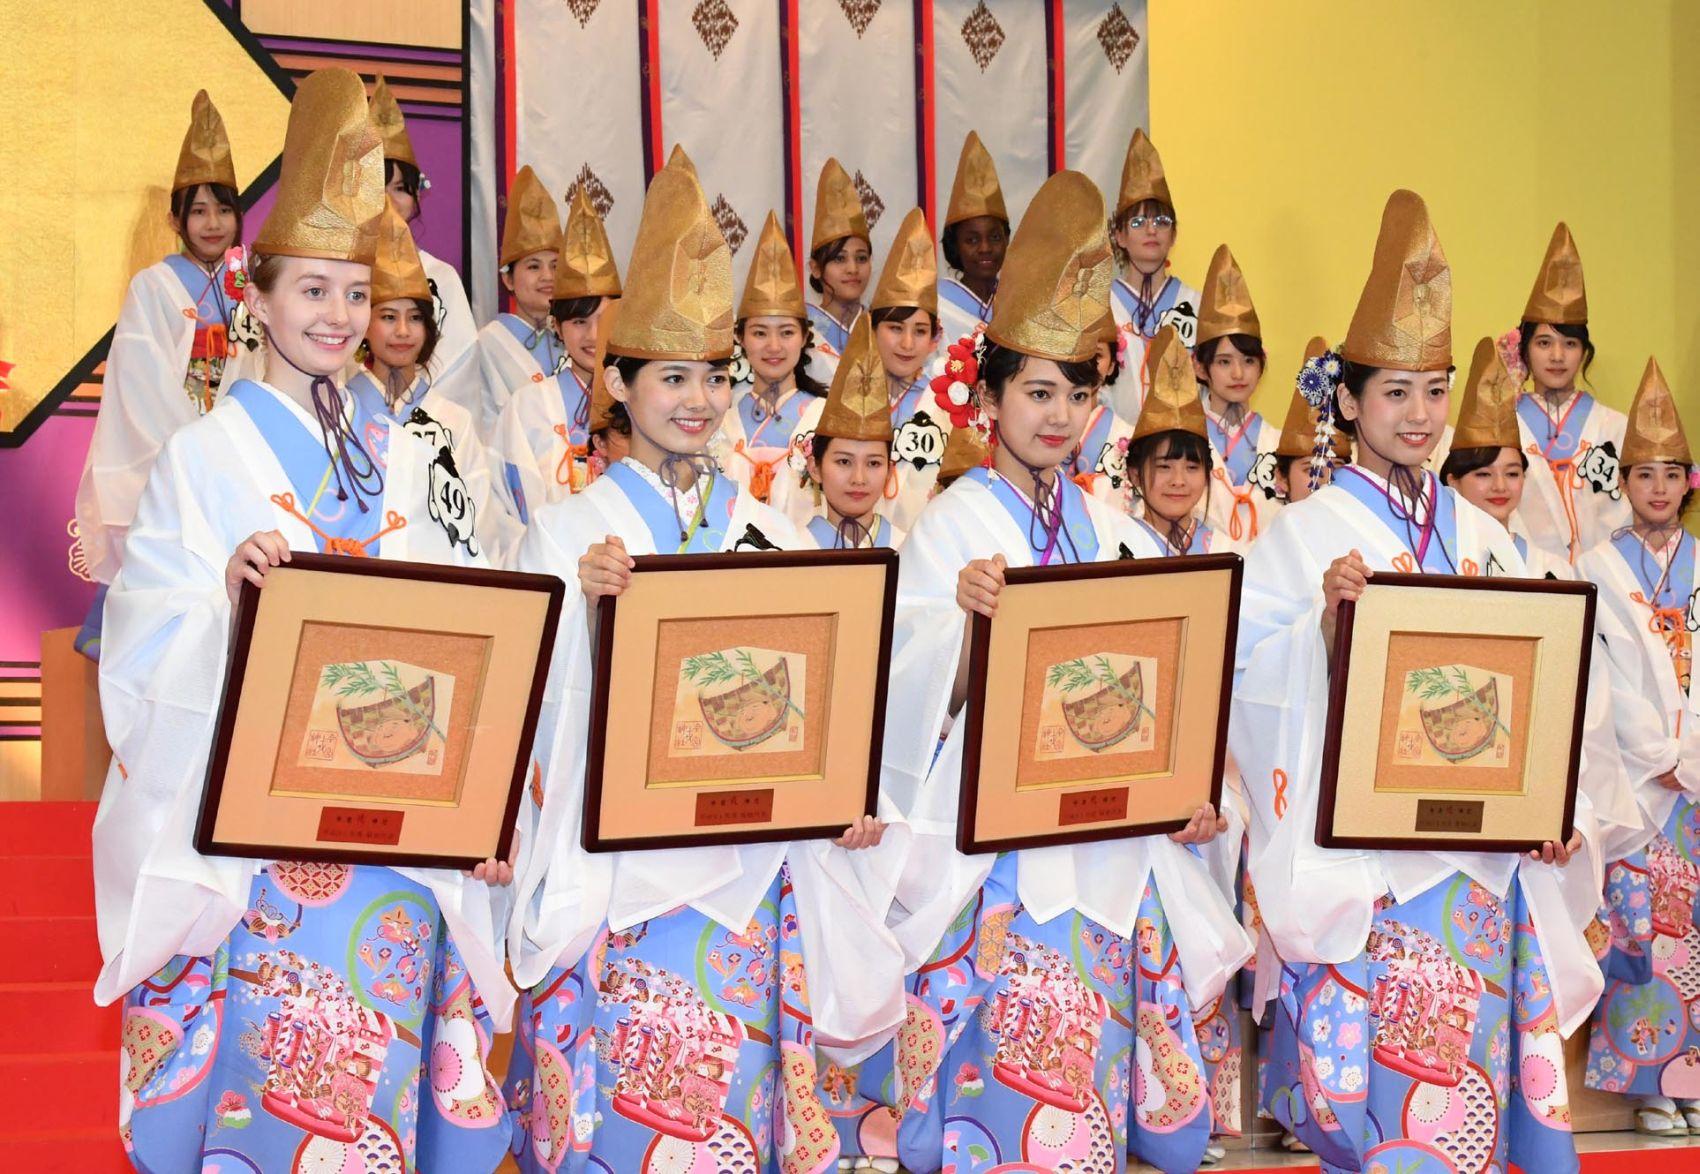 Japan New Year at Osaka's Imamiya Ebisu Shrine